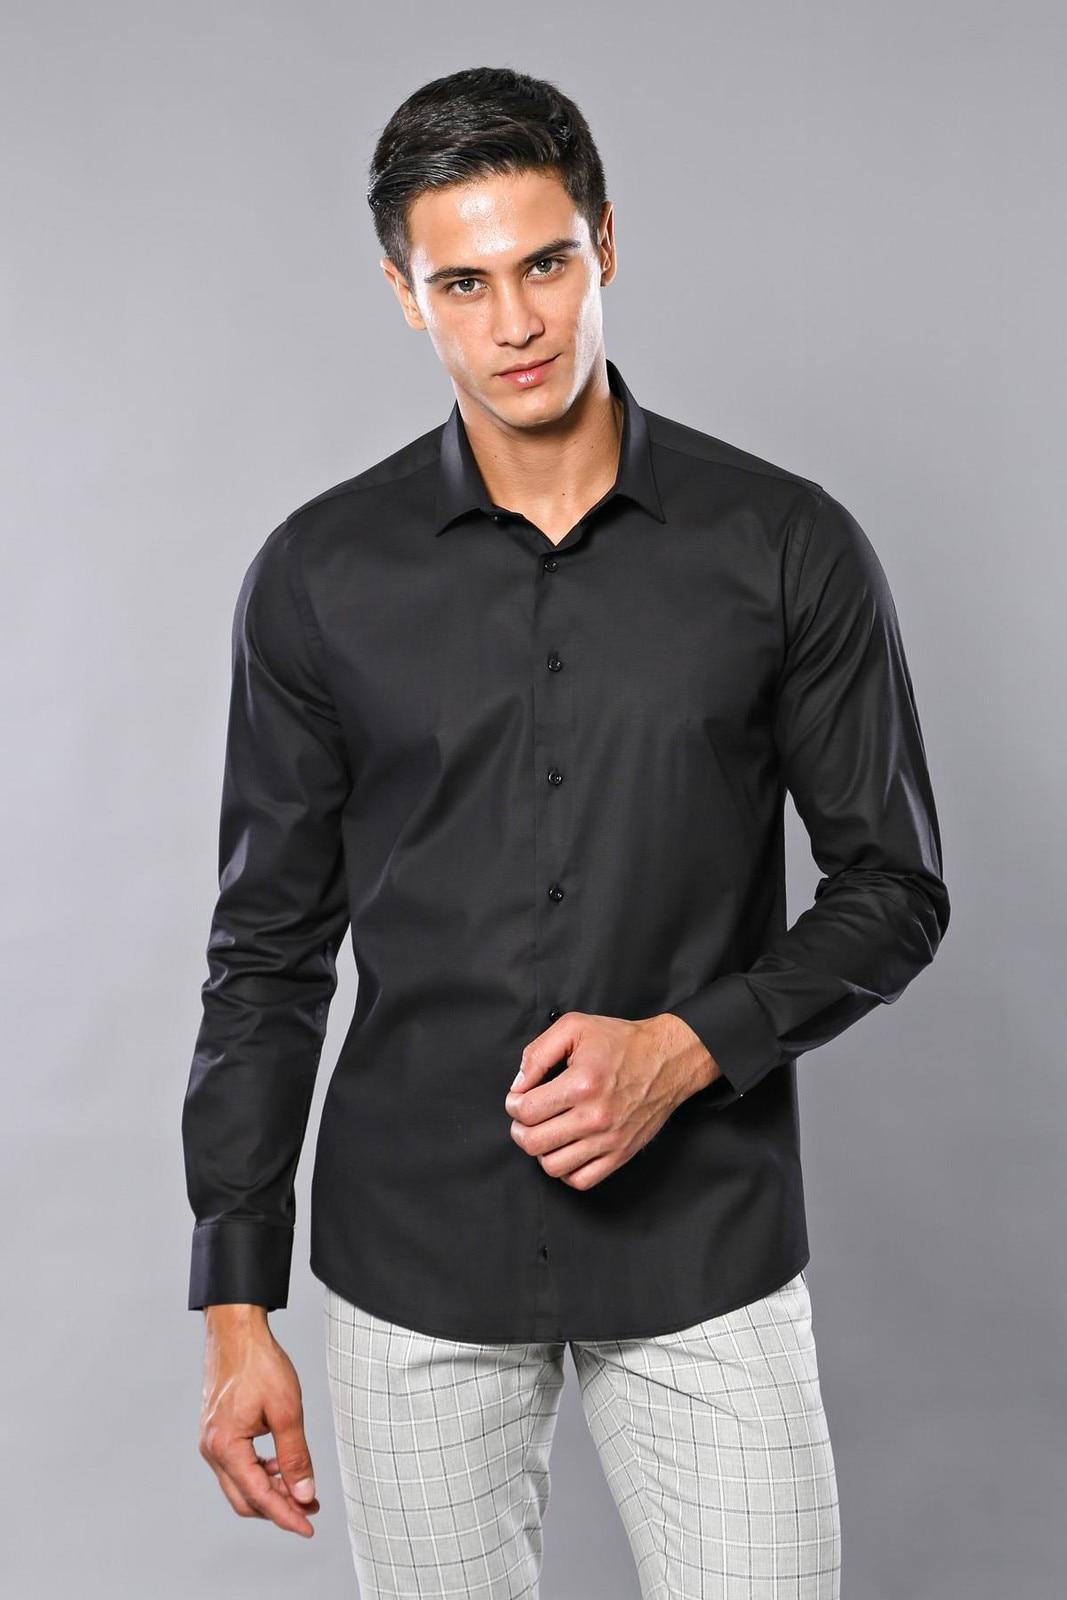 Camiseta plana Slimfit negra para hombre Unimart Shop   Wessi